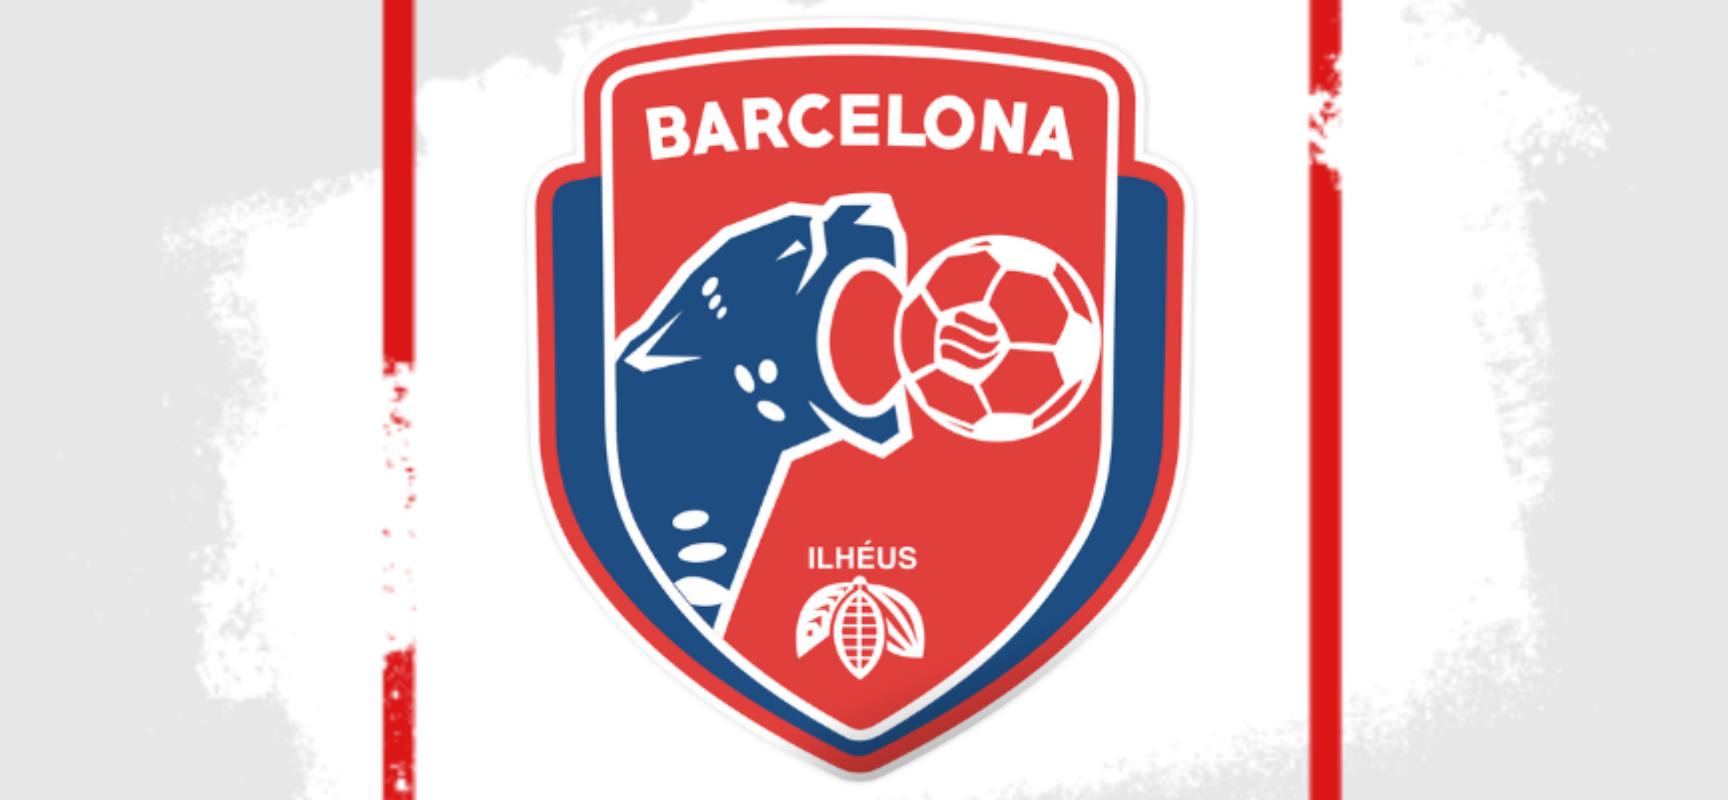 Barcelona de Ilhéus desclassifica o Colo-Colo e decide título da Série B